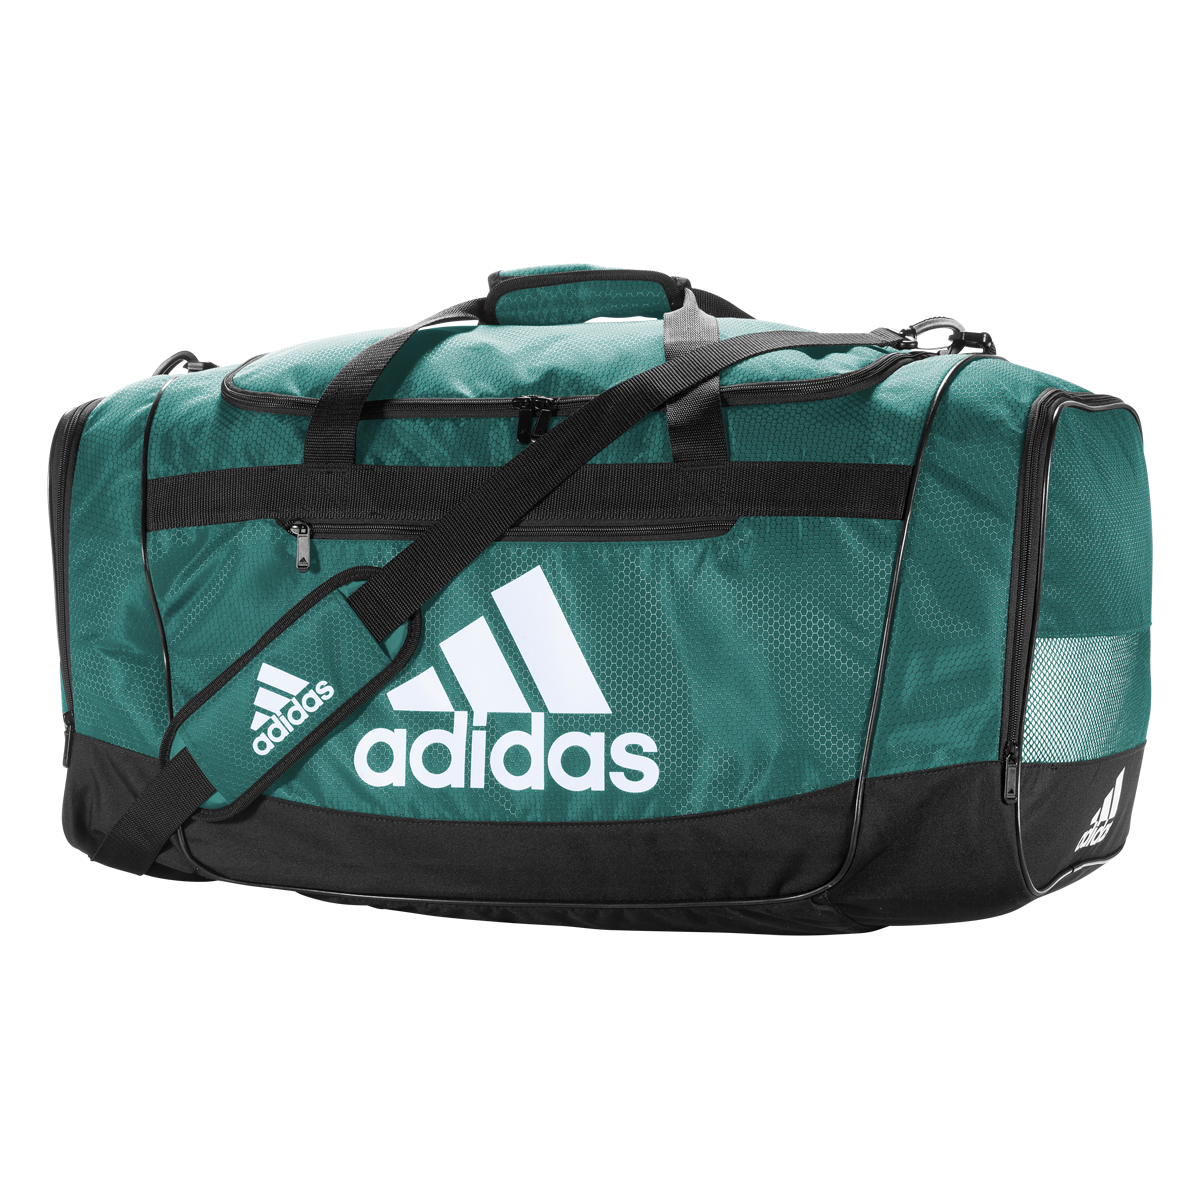 Adidas Defender Iii Small Duffle Green Adidas Bags Sporty